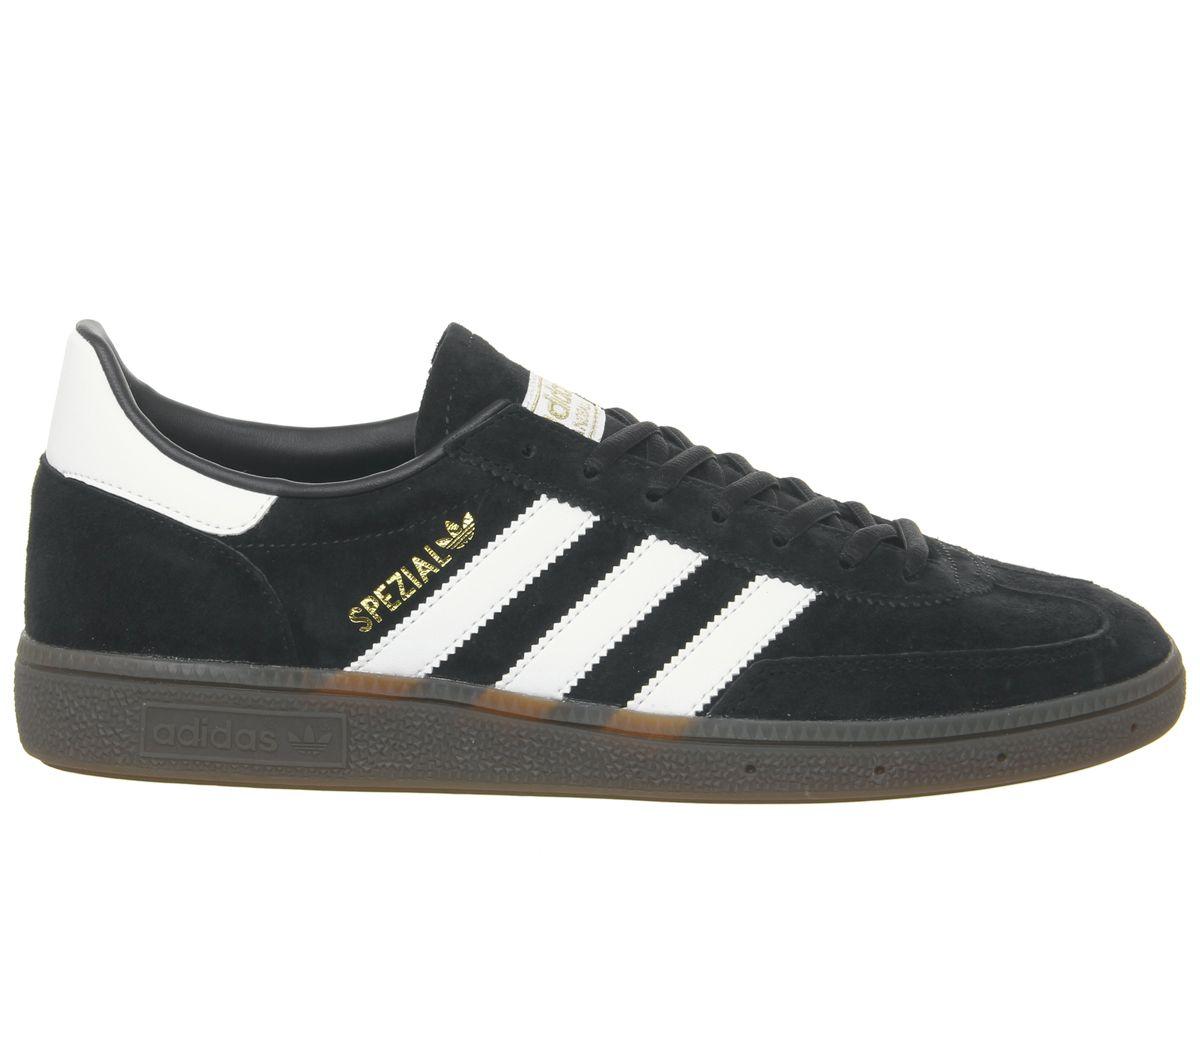 Adidas-Handball-Spezial-Trainers-Core-Black-White-Gum-Trainers-Shoes thumbnail 4